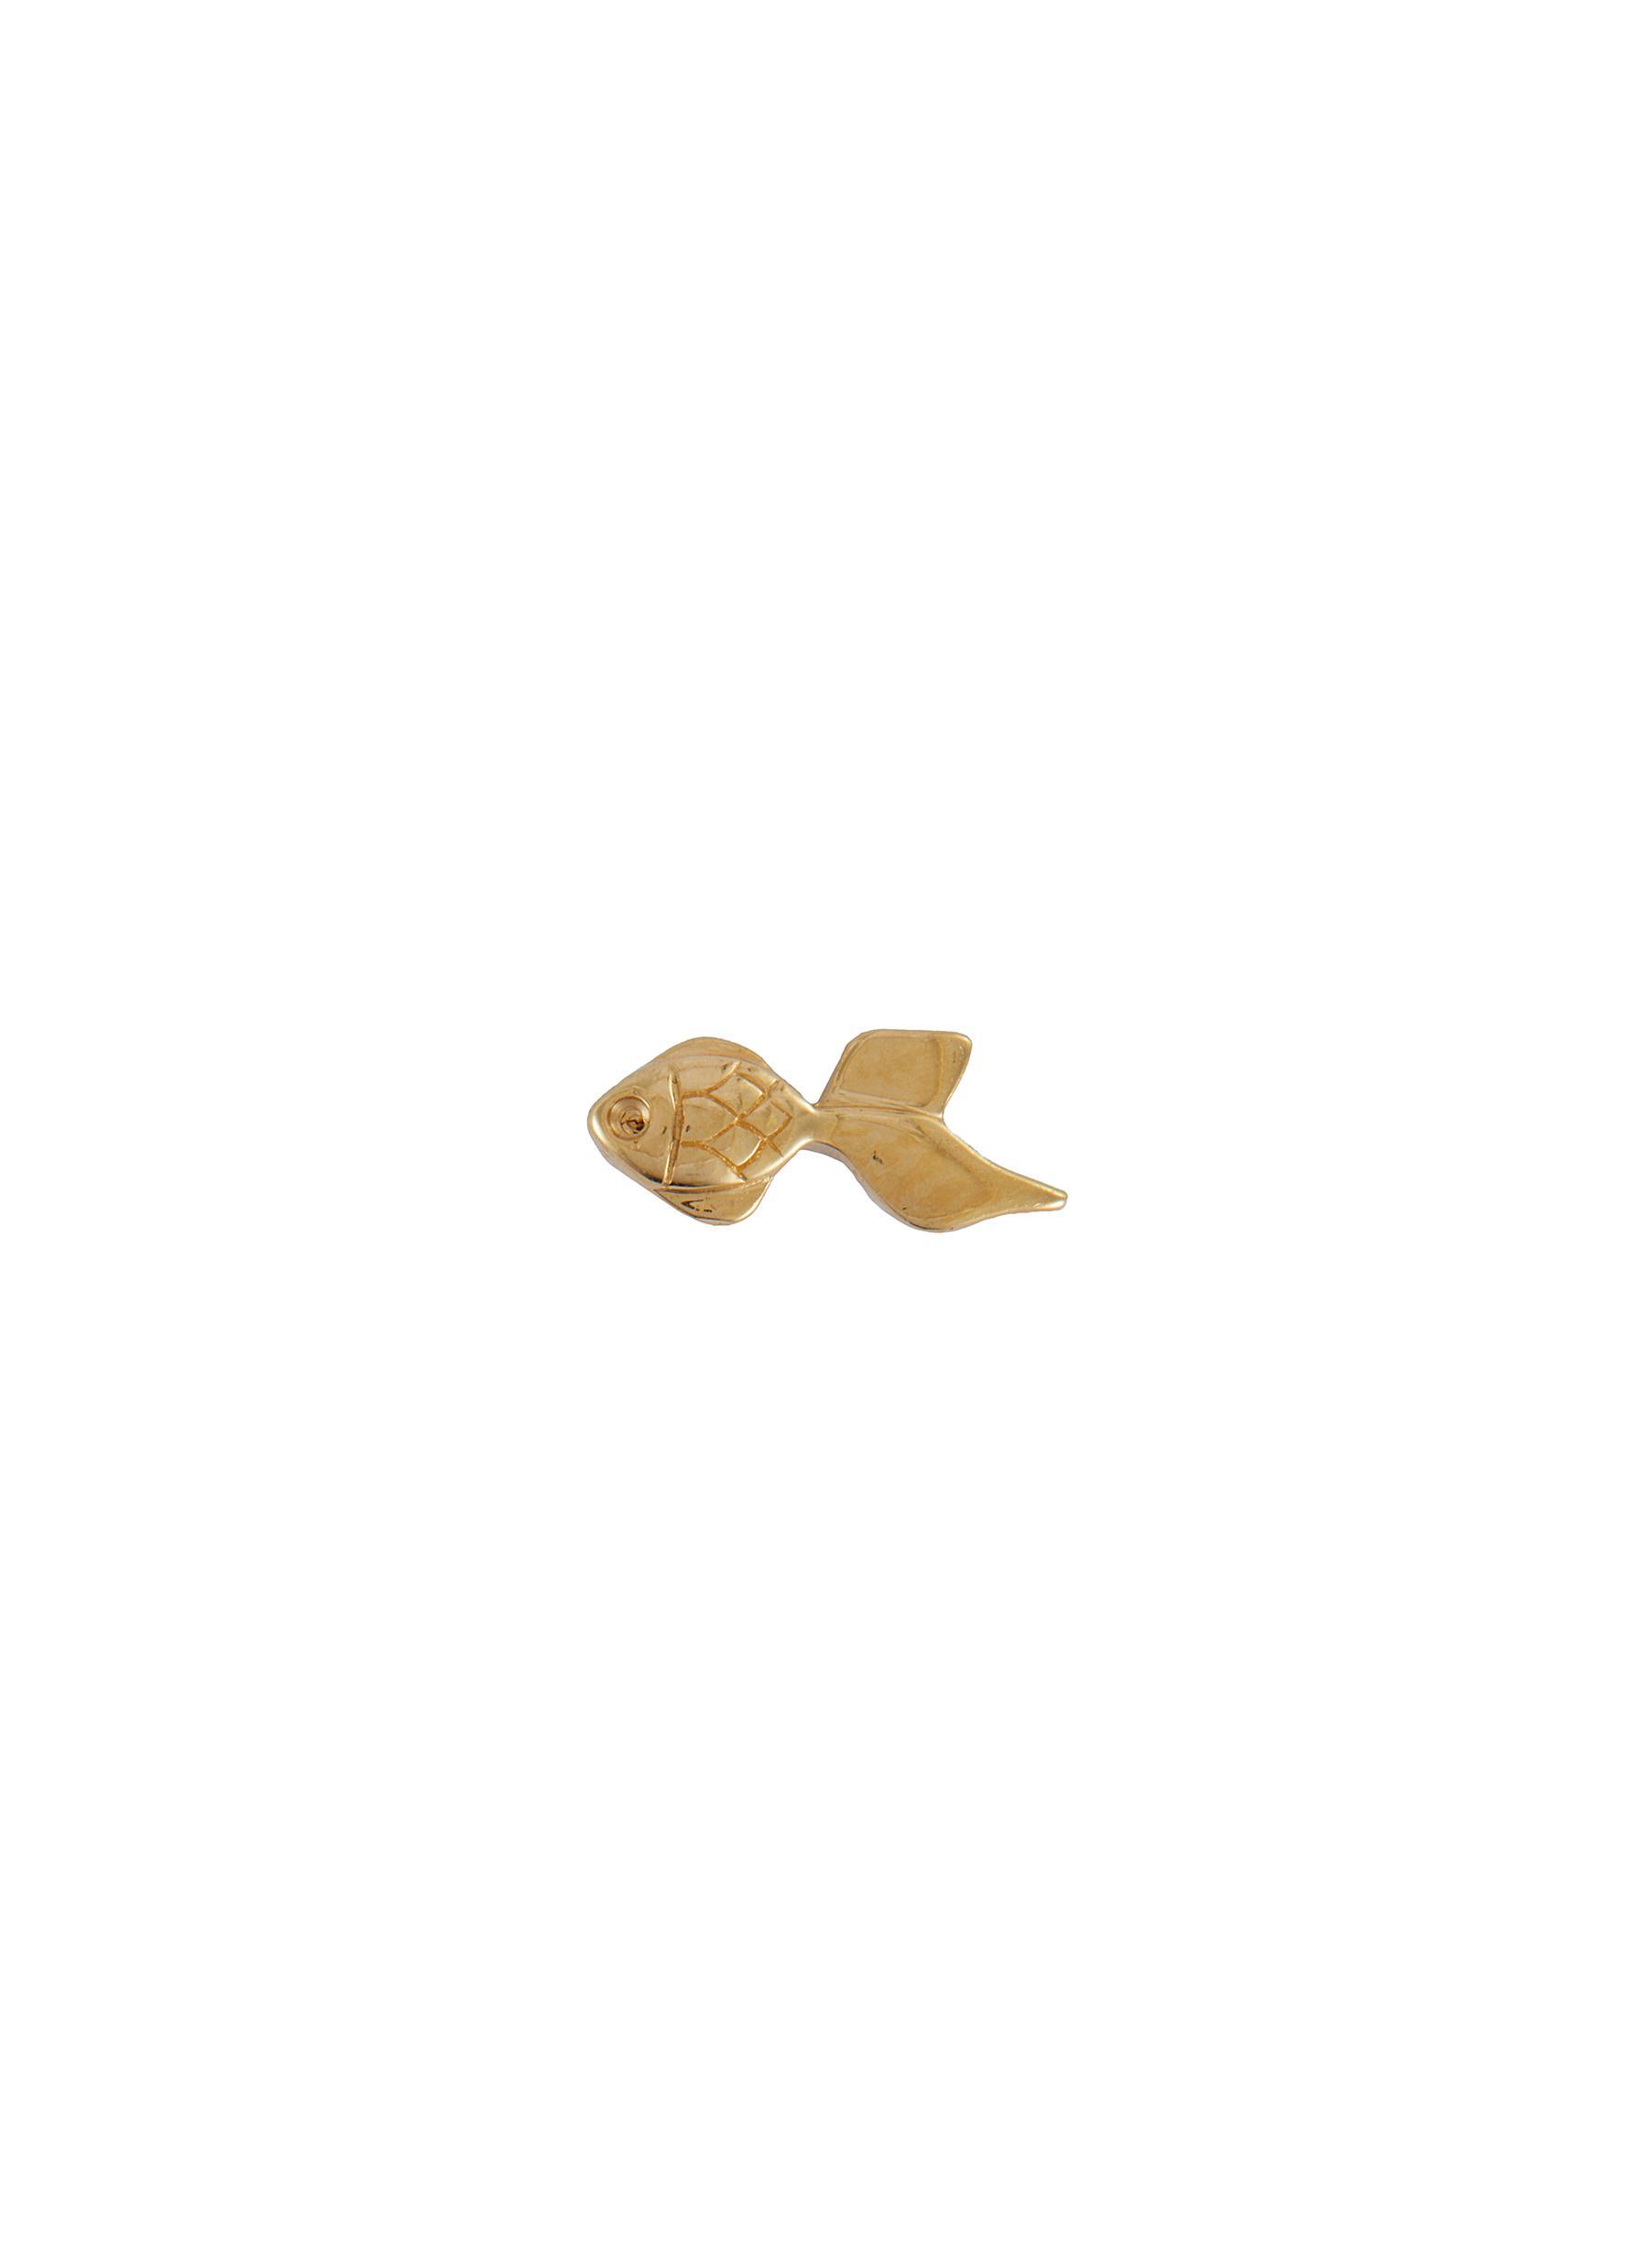 'Goldfish' 18k Gold Charm